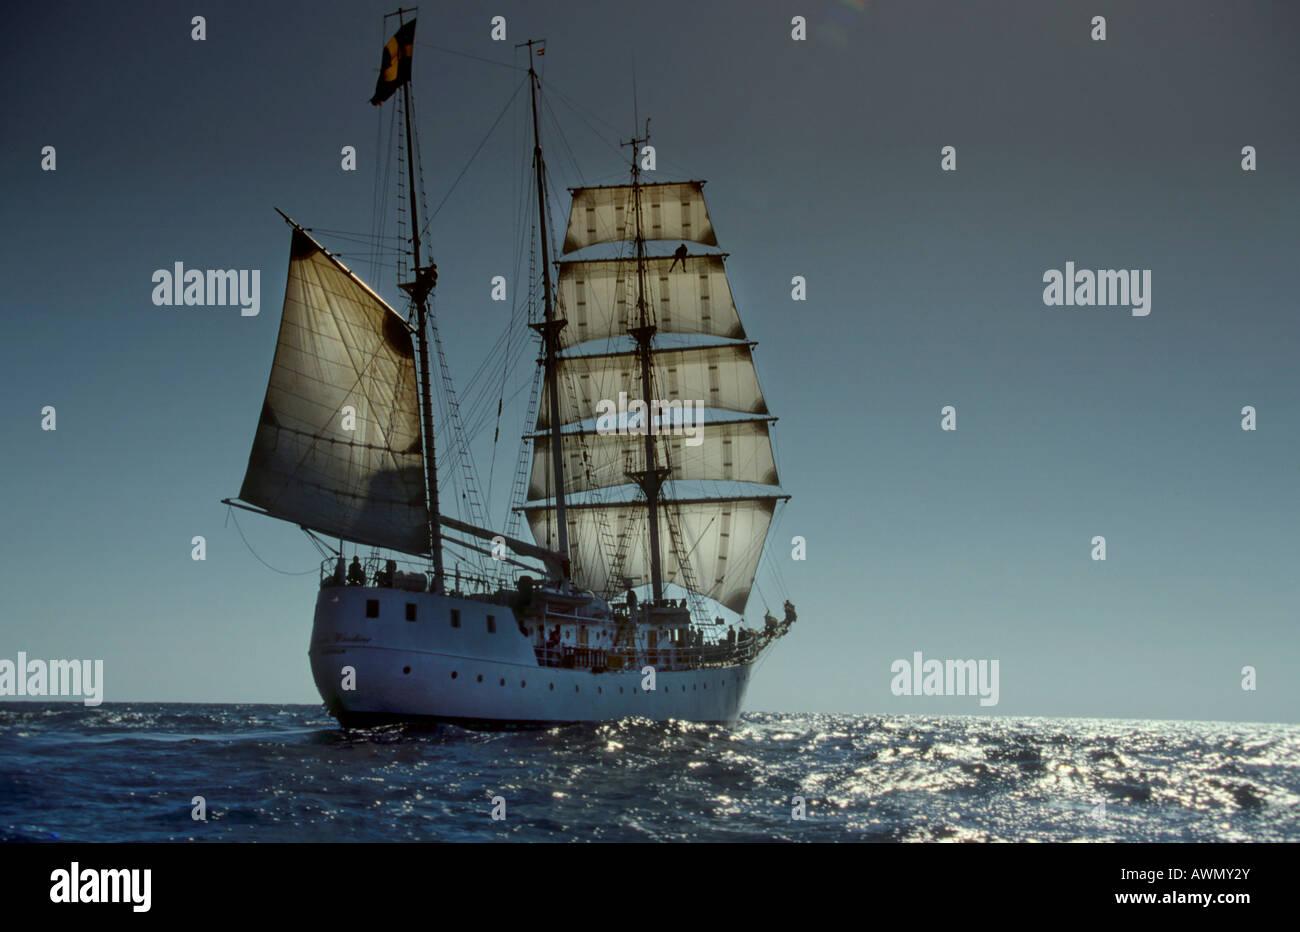 Segelschiffe auf dem meer  Drei-Mast-Segelschiff Amorina, Rotes Meer Stockfoto, Bild: 16617362 ...